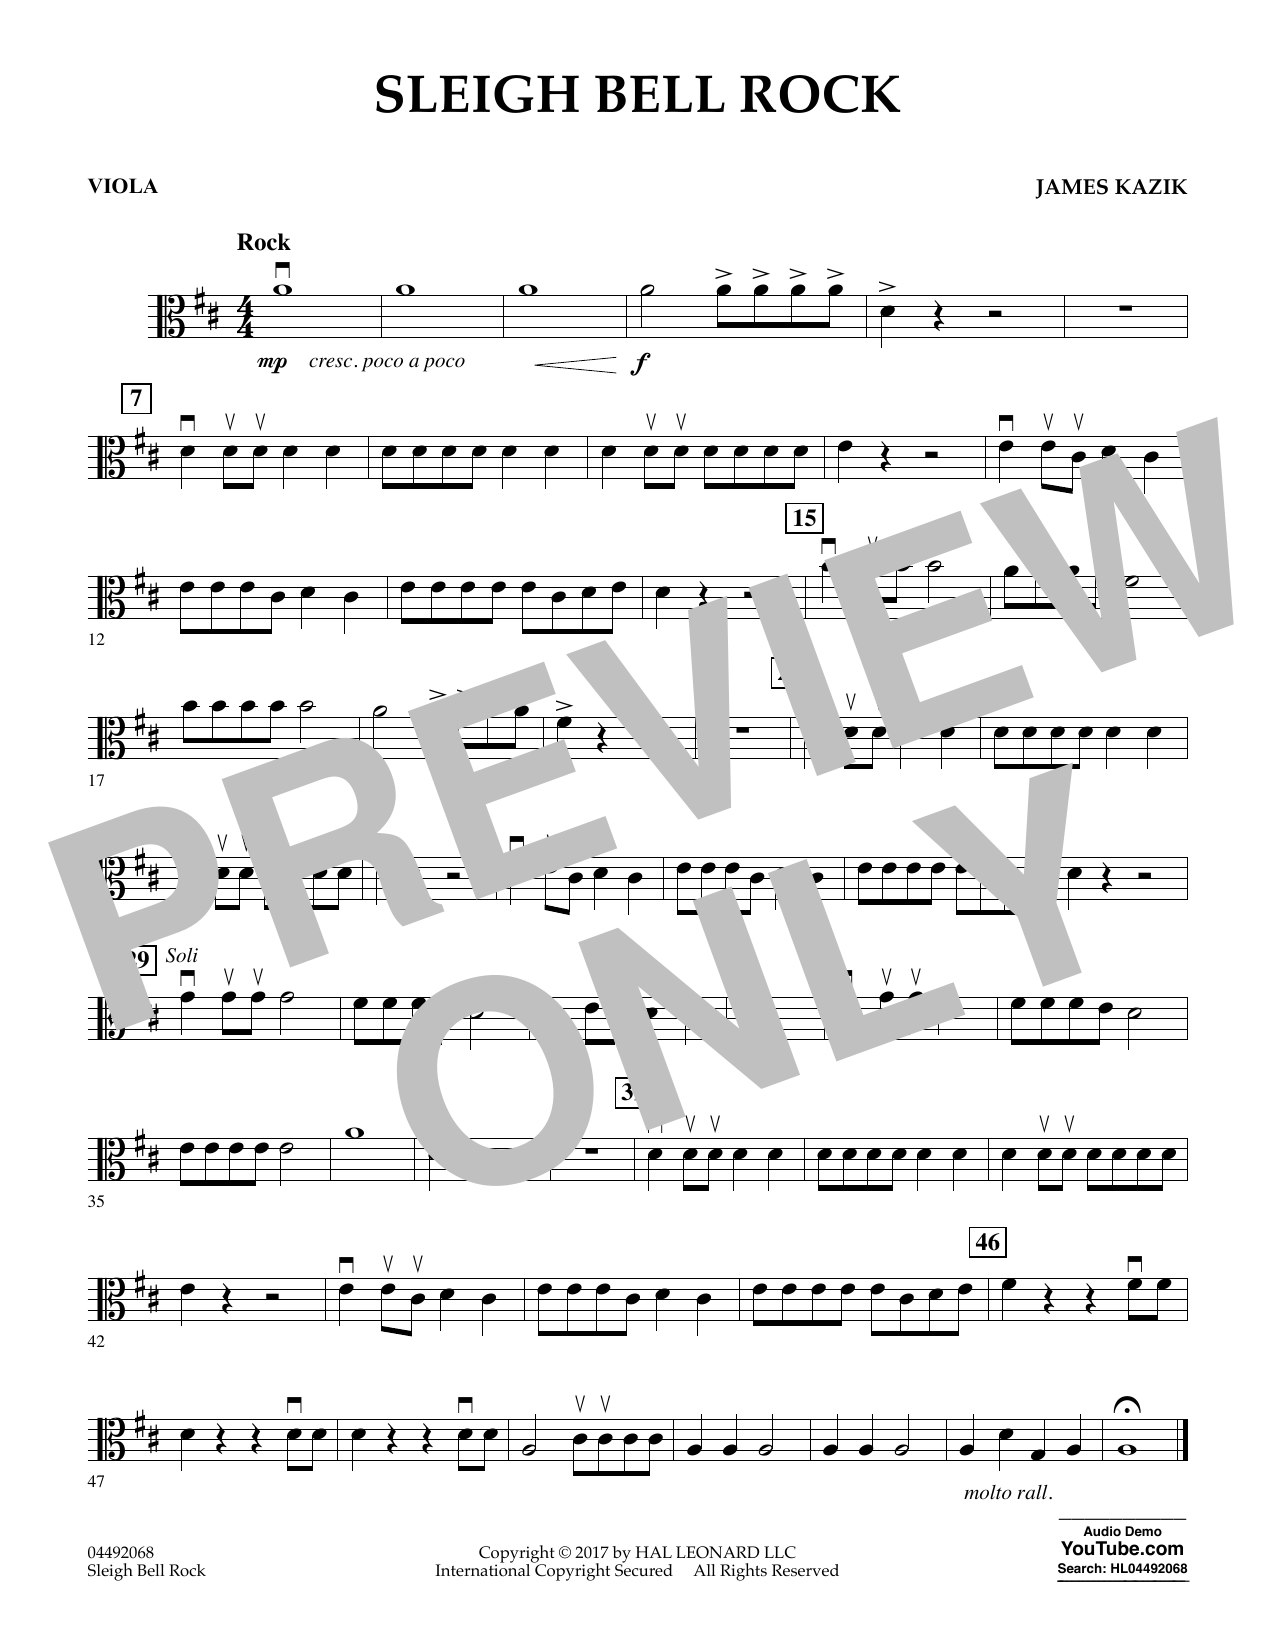 James Kazik Sleigh Bell Rock - Viola sheet music notes and chords. Download Printable PDF.